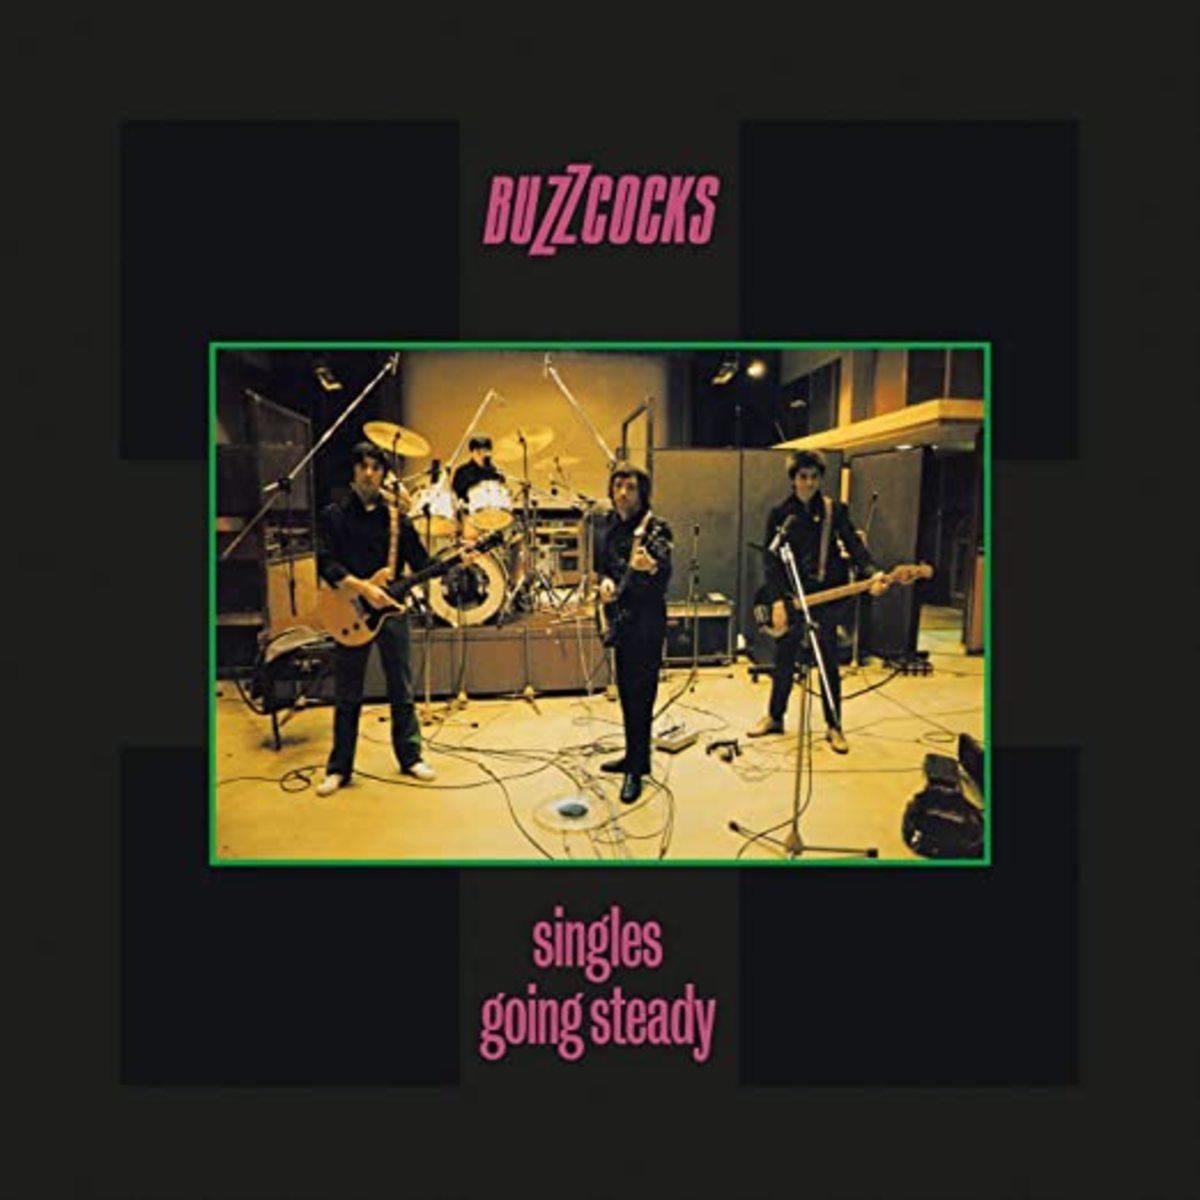 buzzcocks-singles